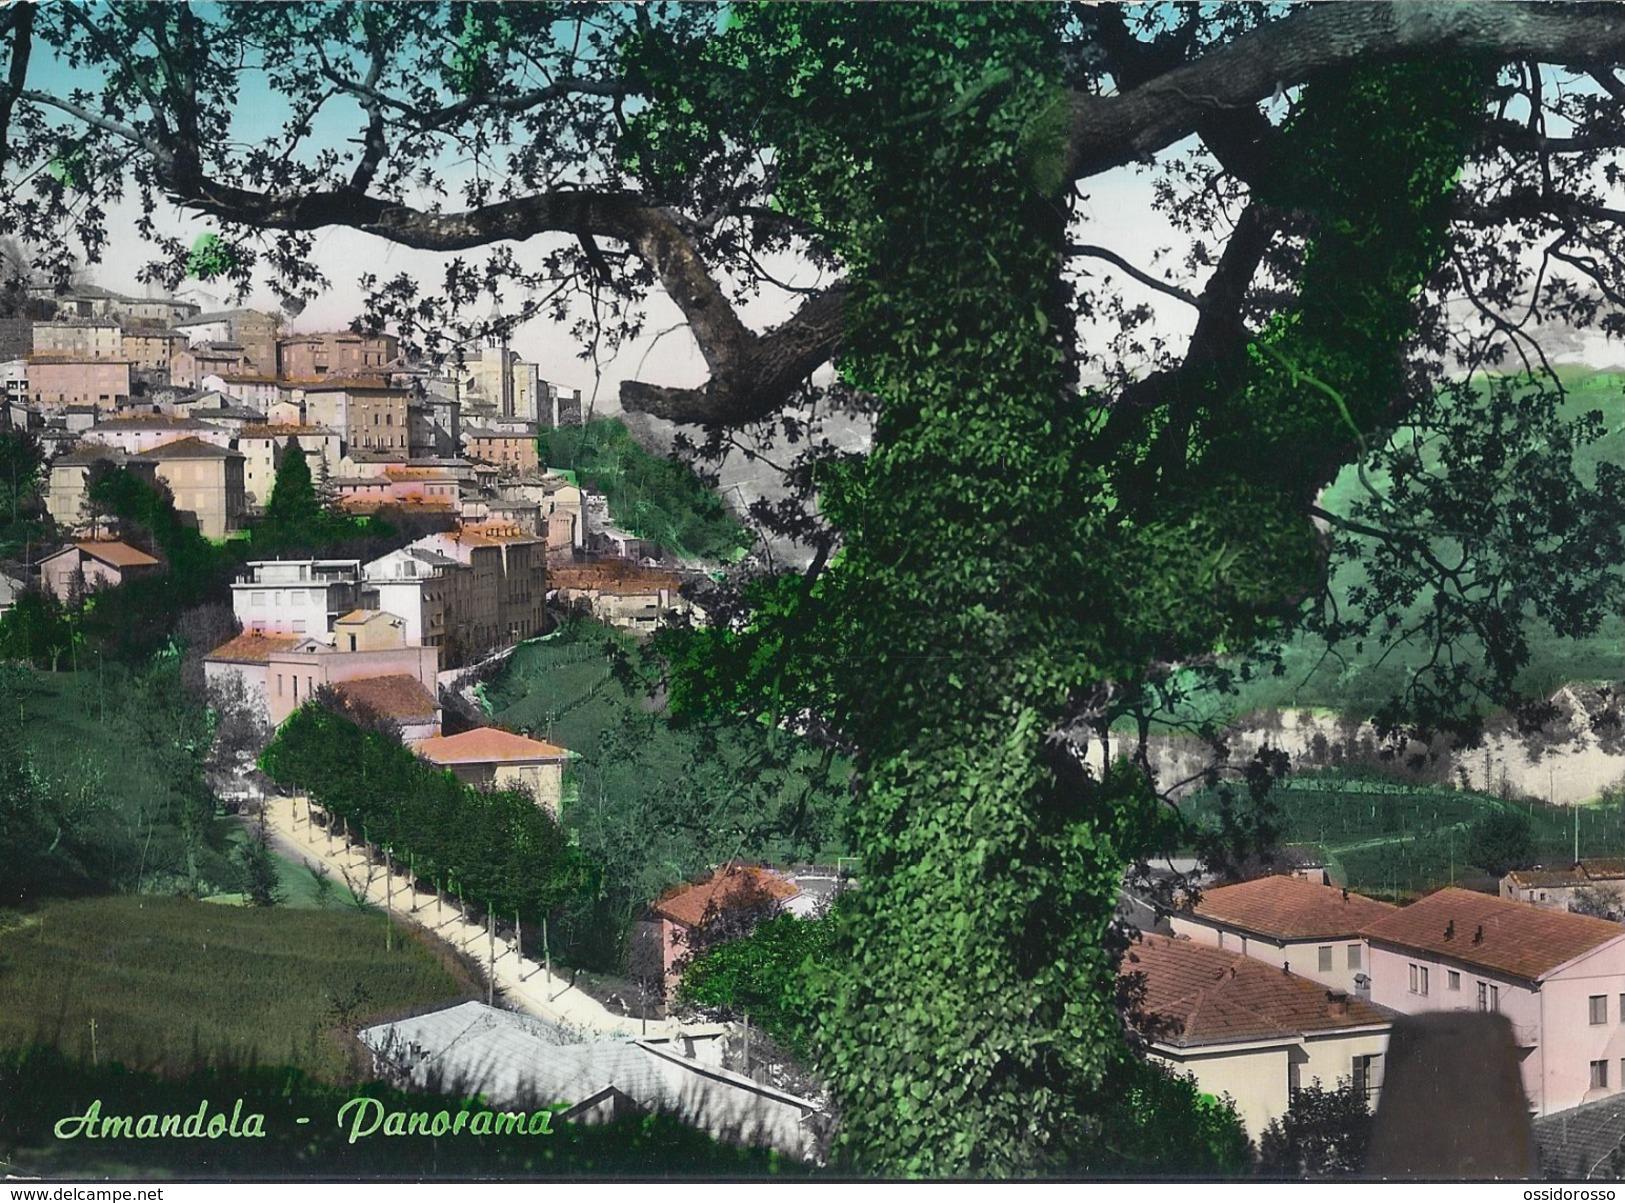 Amandola - Panorama - Fermo